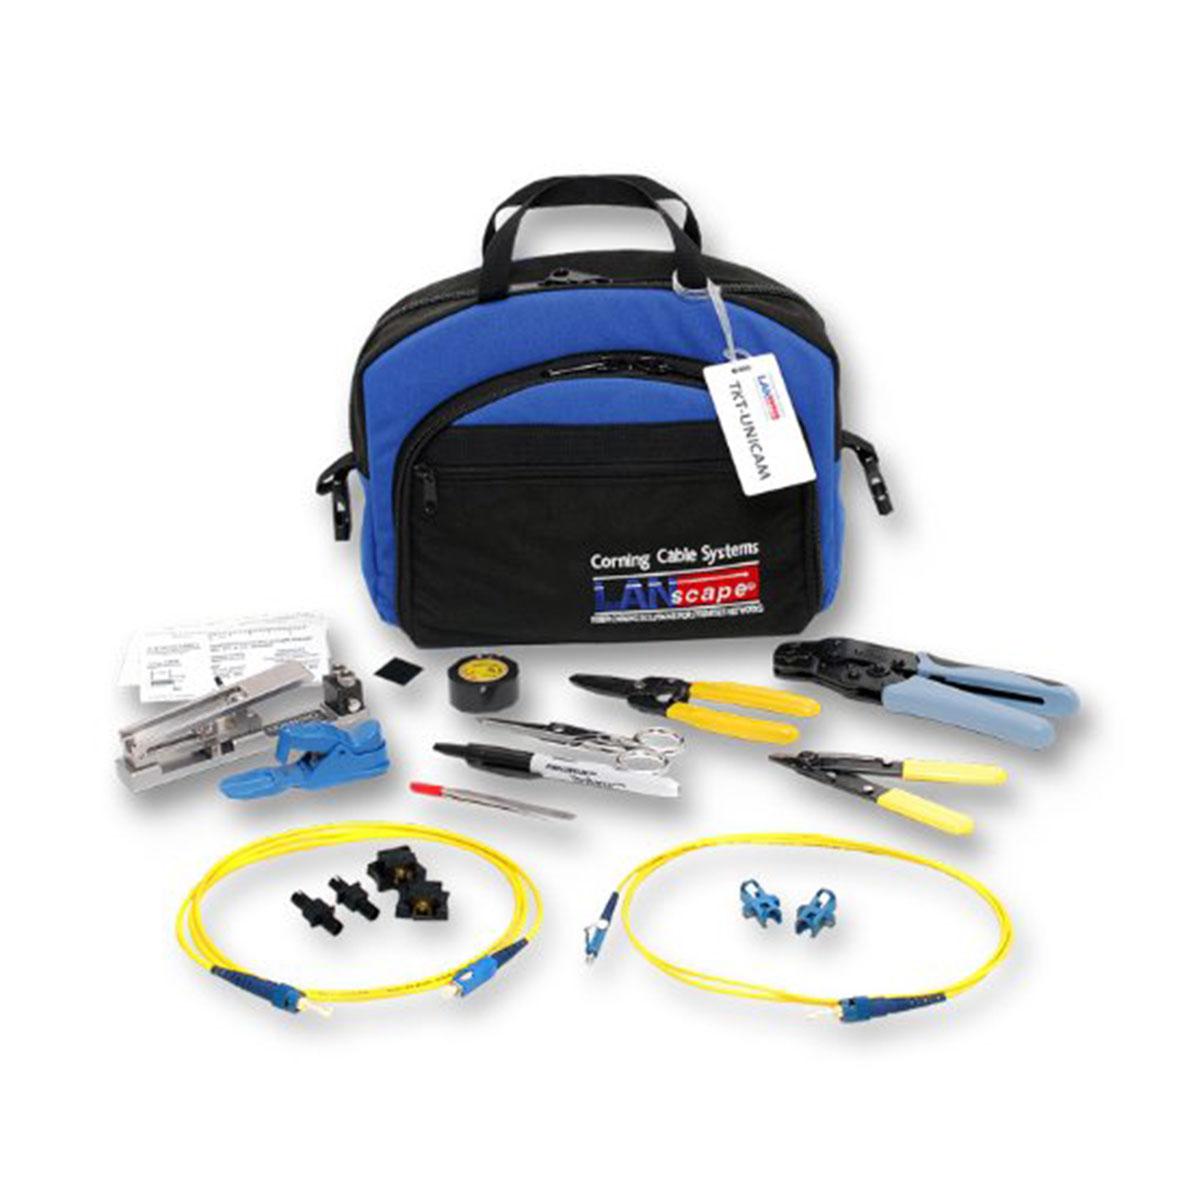 Kit de herramientas de empalme Corning TKT-100-02